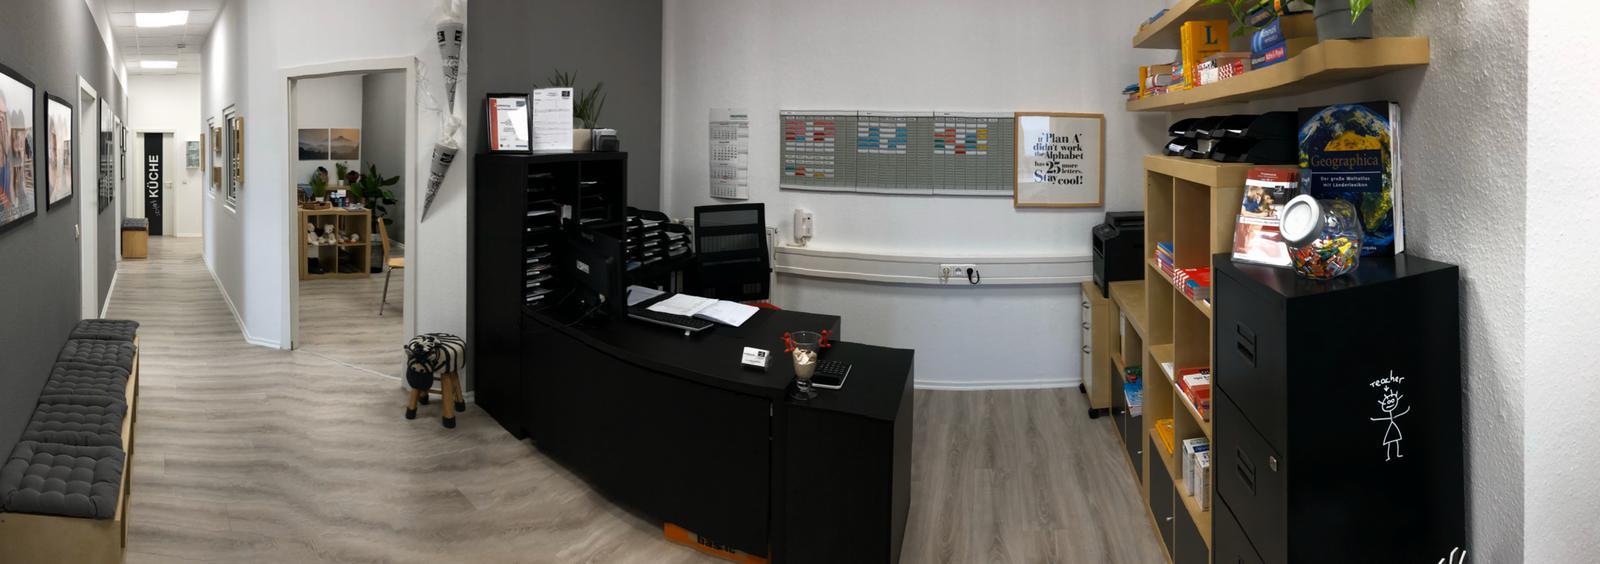 Empfang und Büroleitung back2school Nachhilfeschule Nachhilfe Sprockhövel Hauptstraße 73 in Niedersprockhövel